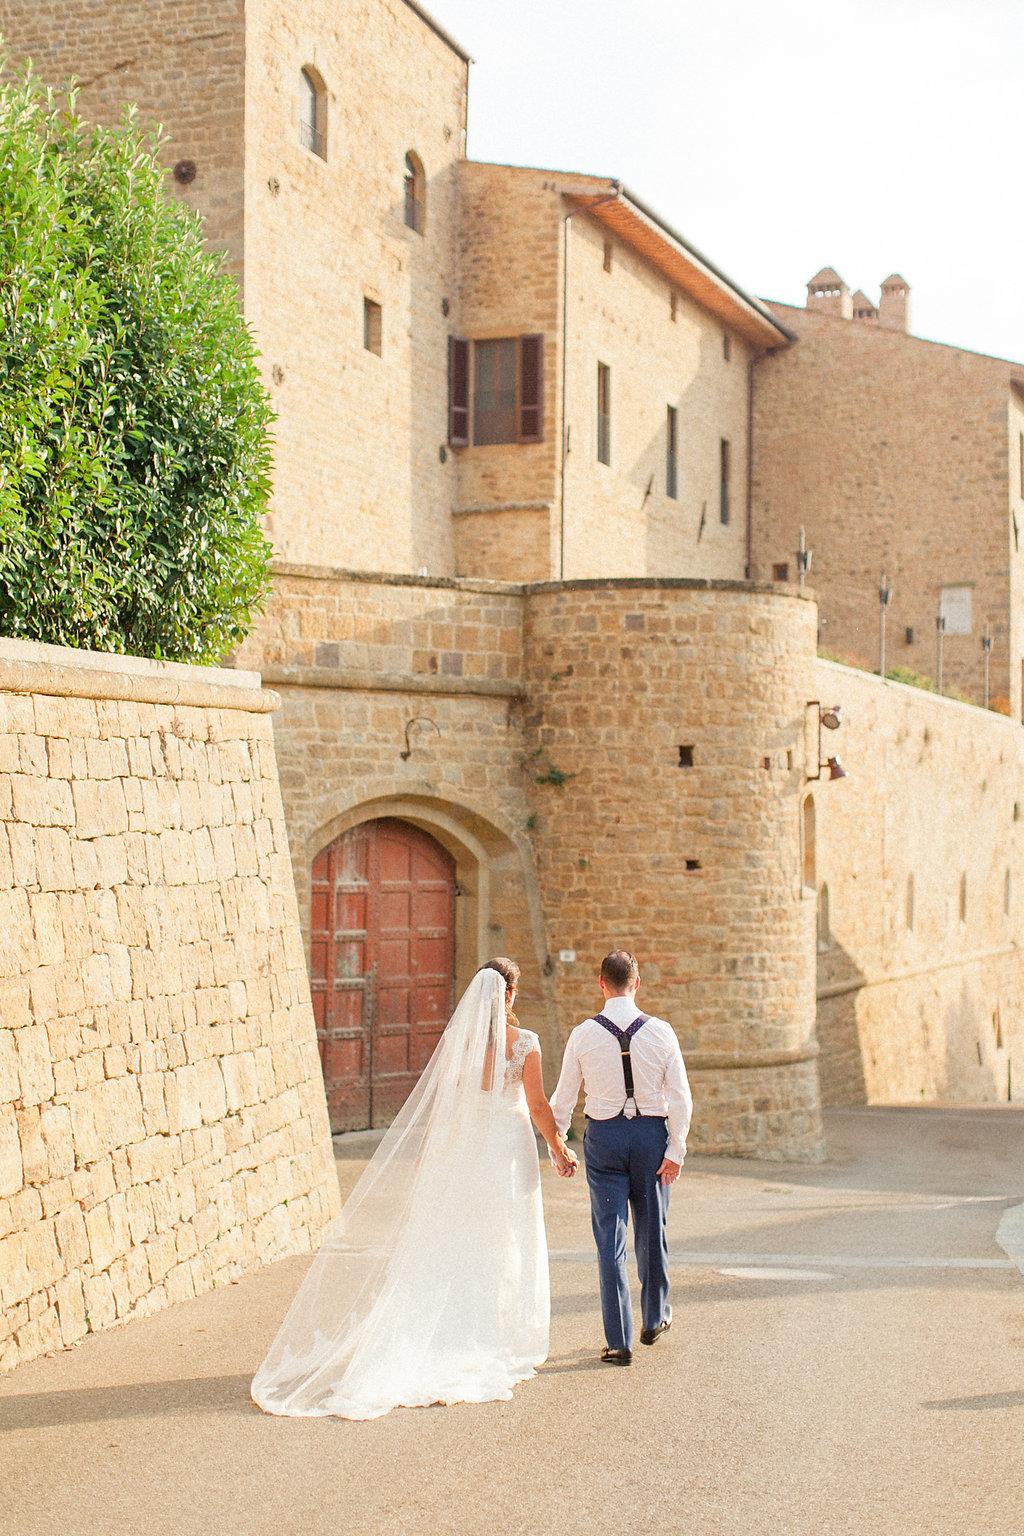 castelfalfi-tuscany-wedding-photographer-roberta-facchini-376